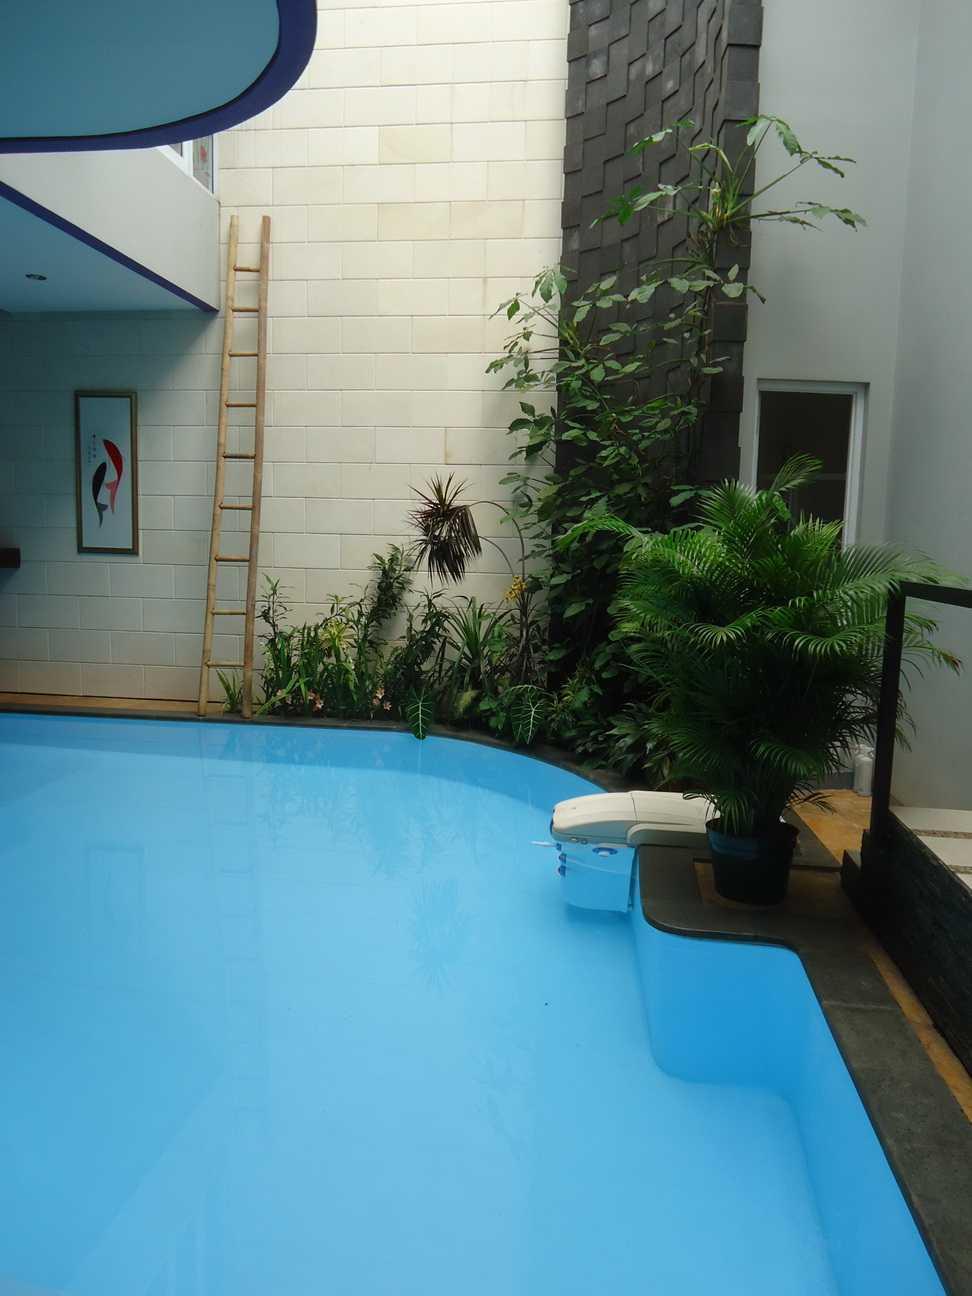 Budi Dharma The Relaxation House Gelong Selatan - Tomang Gelong Selatan - Tomang Gelong-Selatan-02   23851